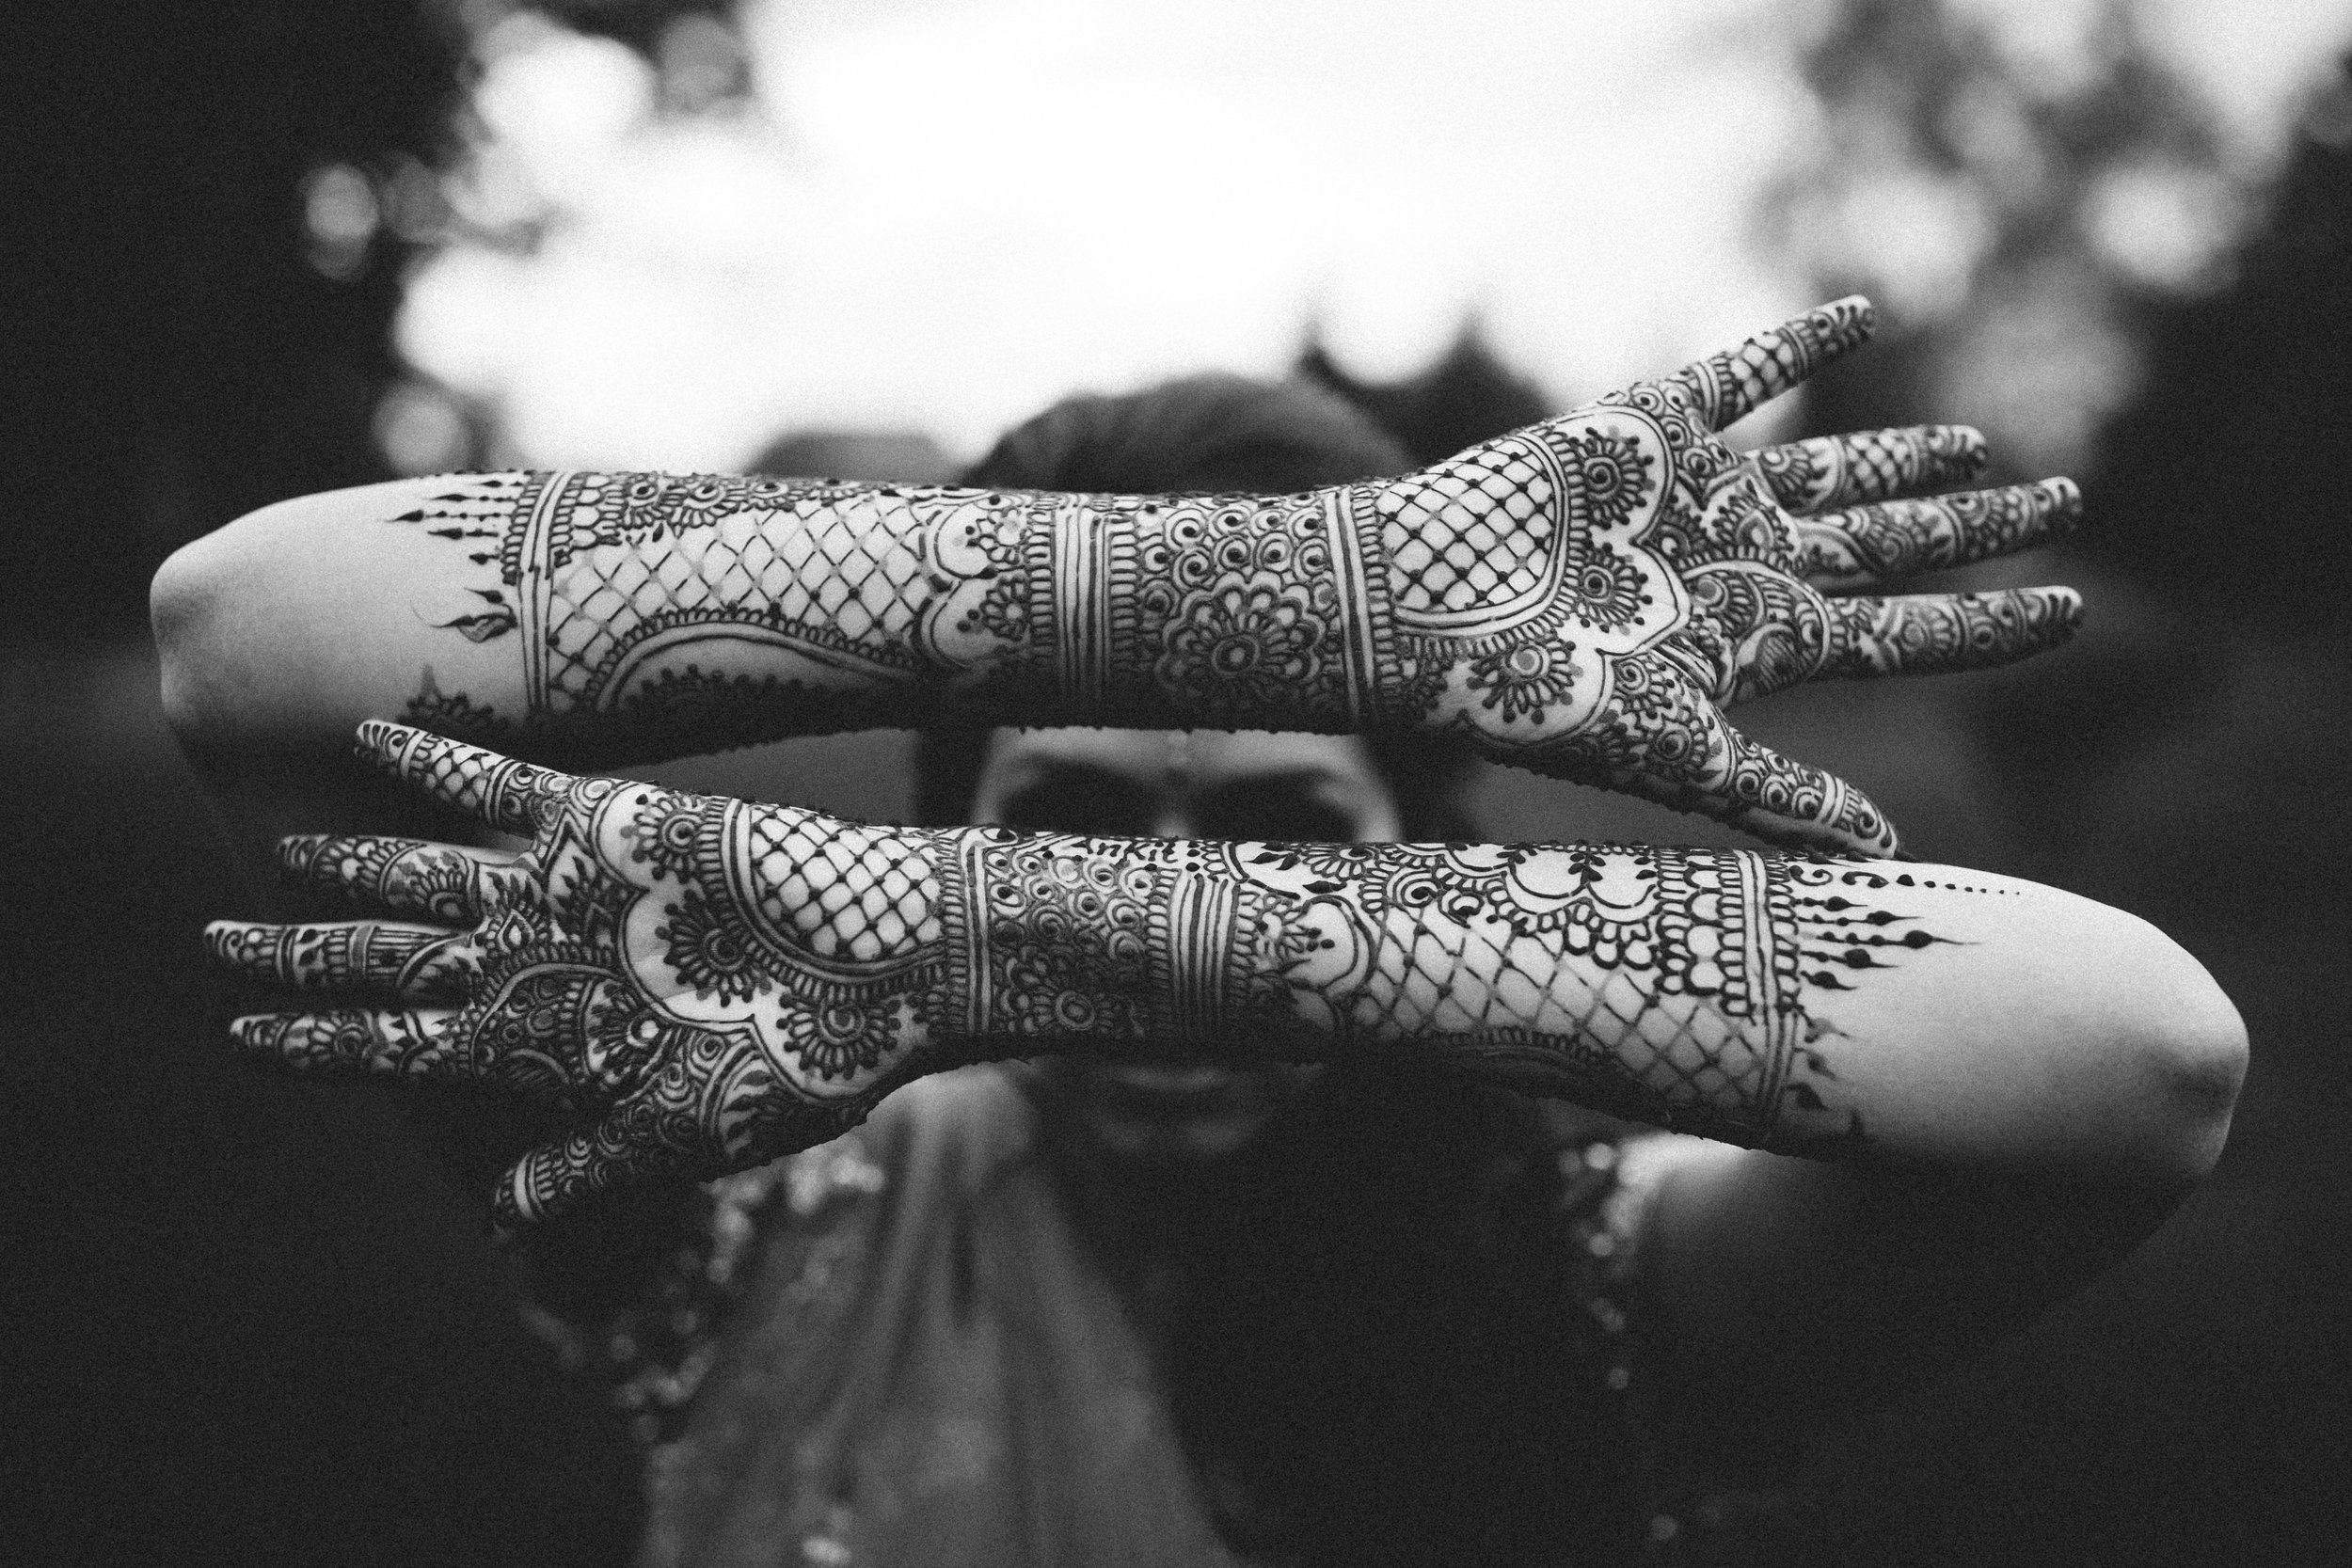 Aparna-Ankit-Patel-Mehndi-Wedding-Photos-0083.jpg